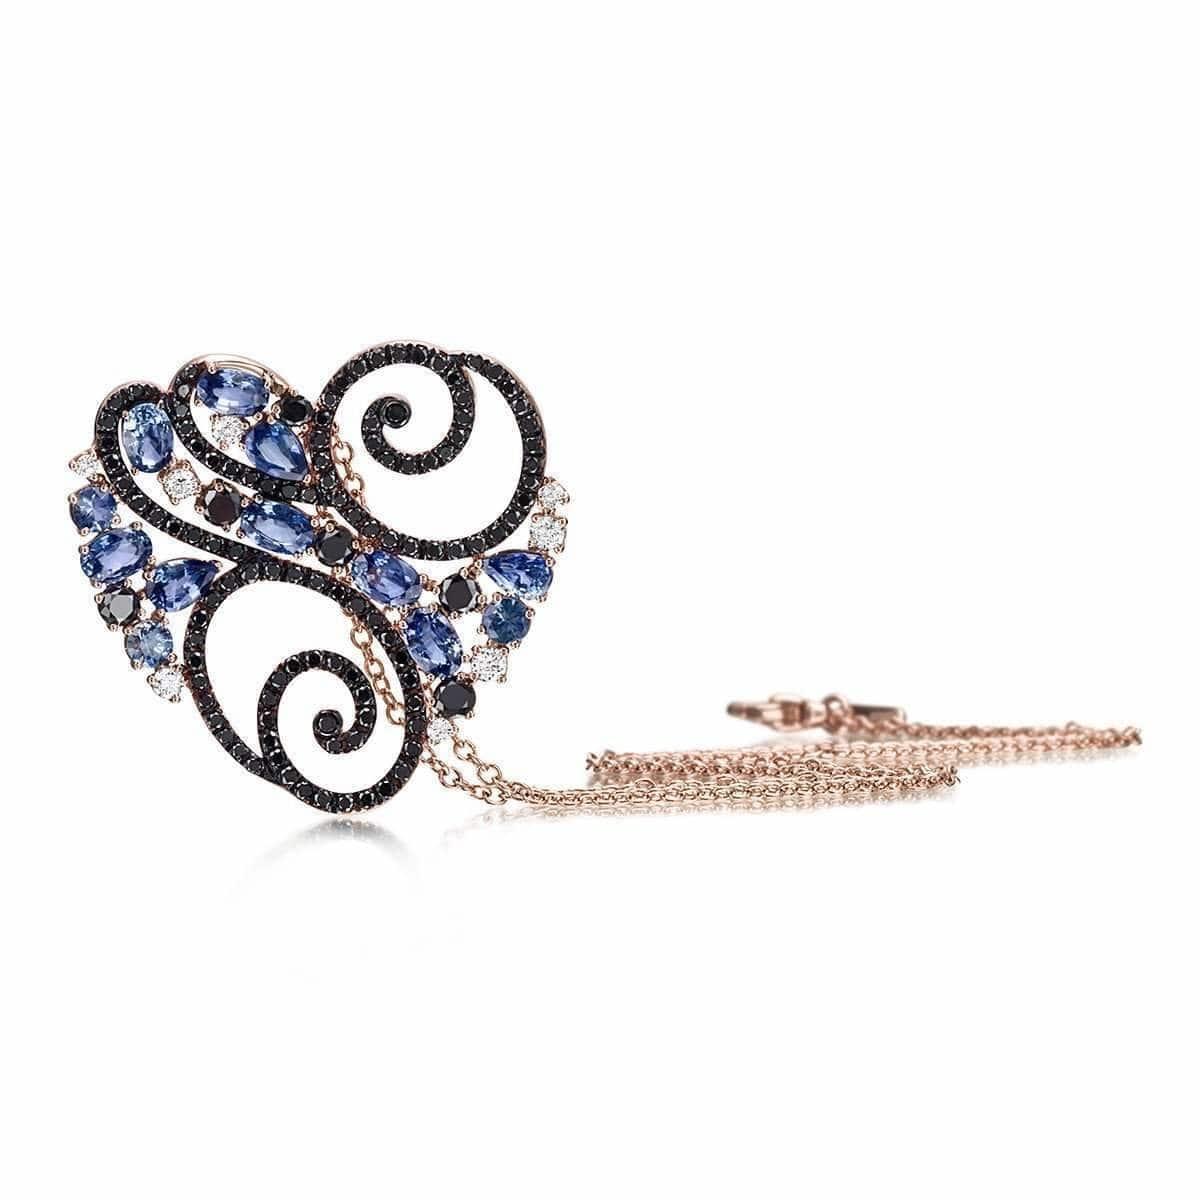 Rose Gold, Diamond & Sapphire Ramage Collection Necklace | Pinomanna